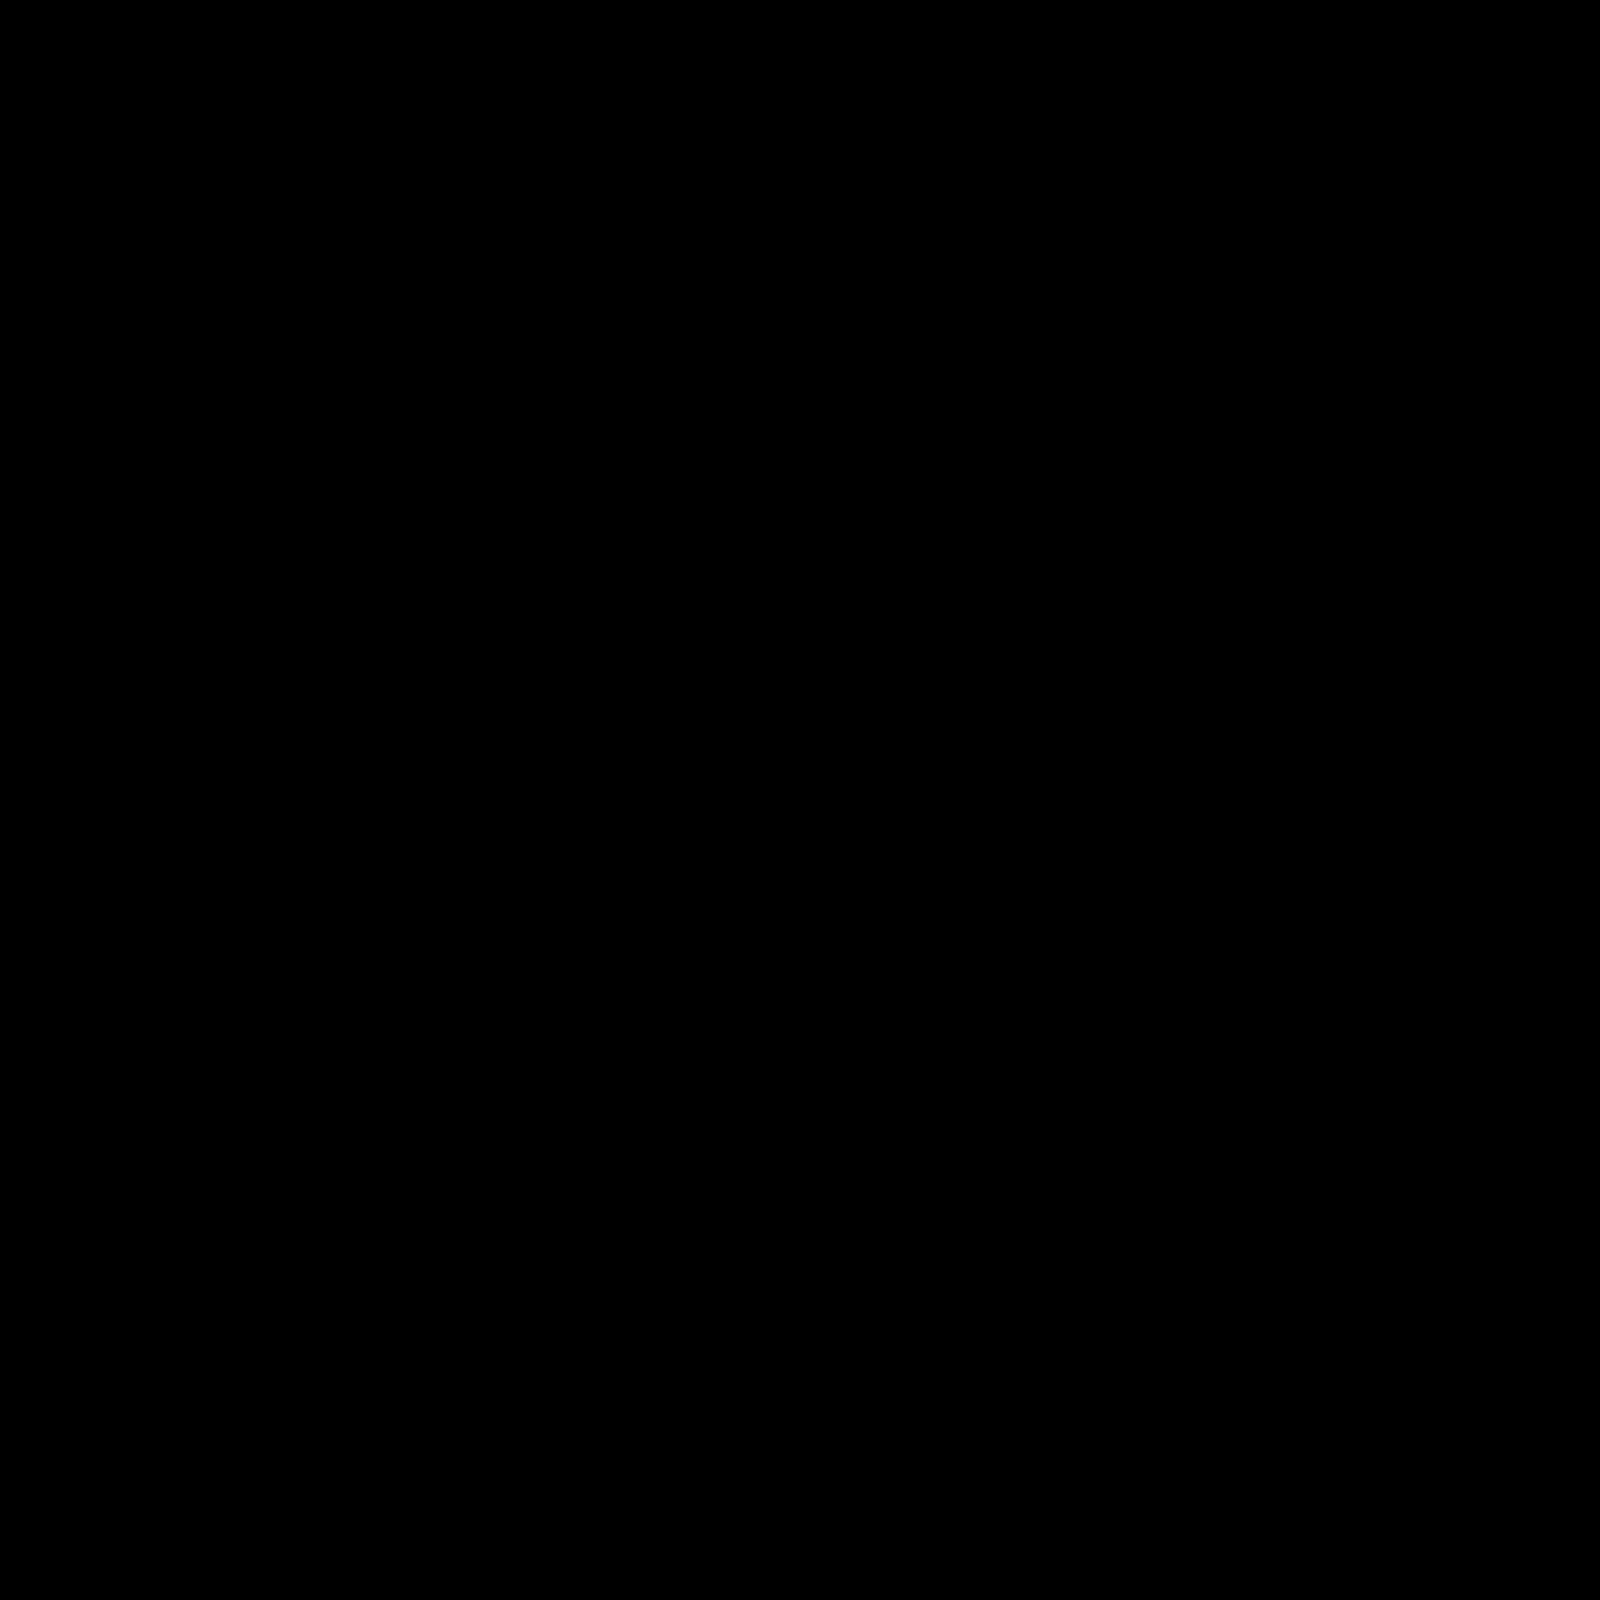 配料 icon